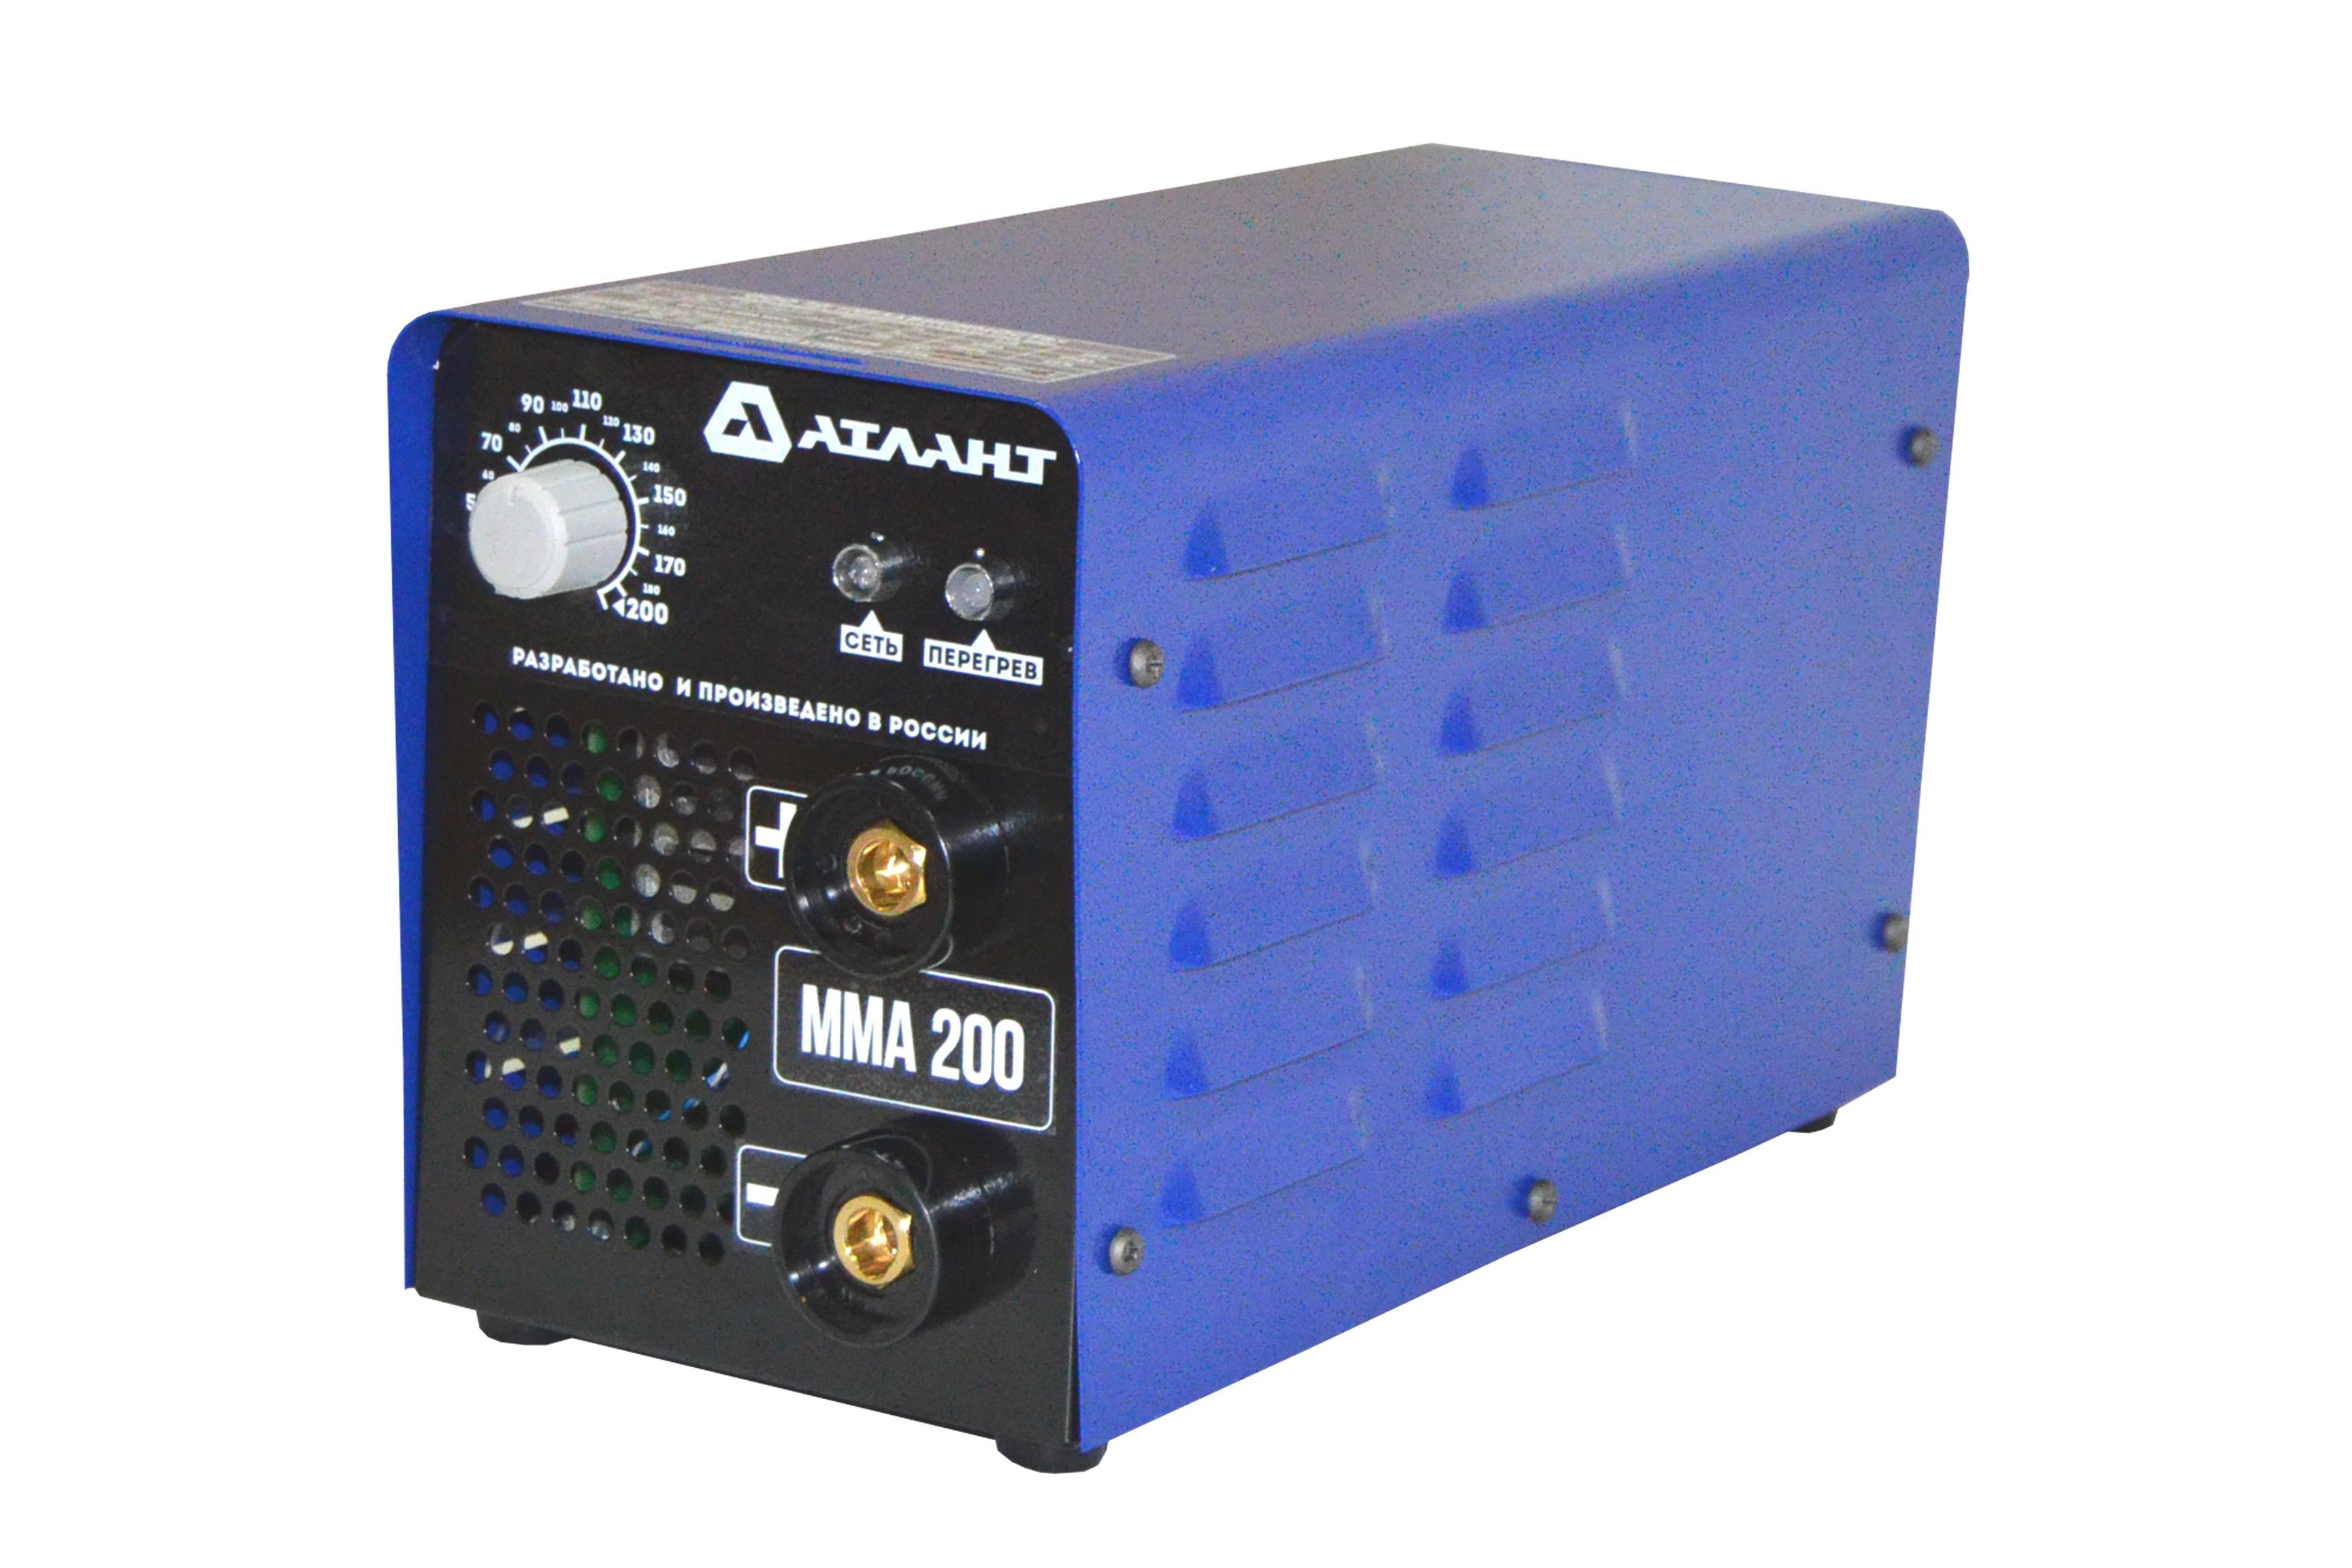 Сварочный аппарат АТЛАНТ ММА-200А сварочный трансформатор спец мма 180 ас s